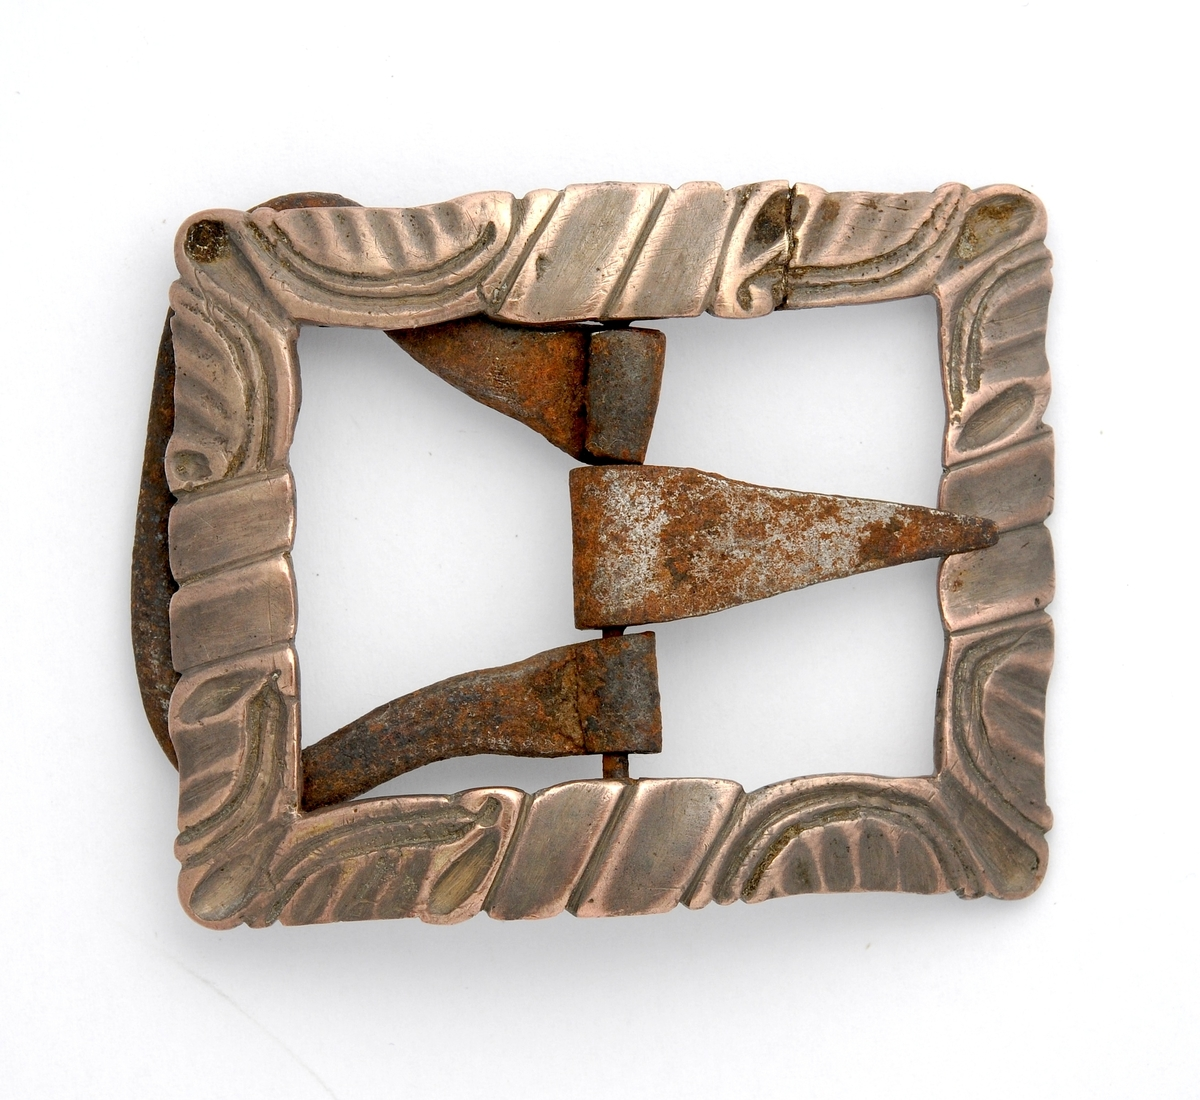 Spenne støypt i messing. Rektangulær form. Stolpe, kalv og tann i smidd jern. Har same mønsteret som VFF 00527.